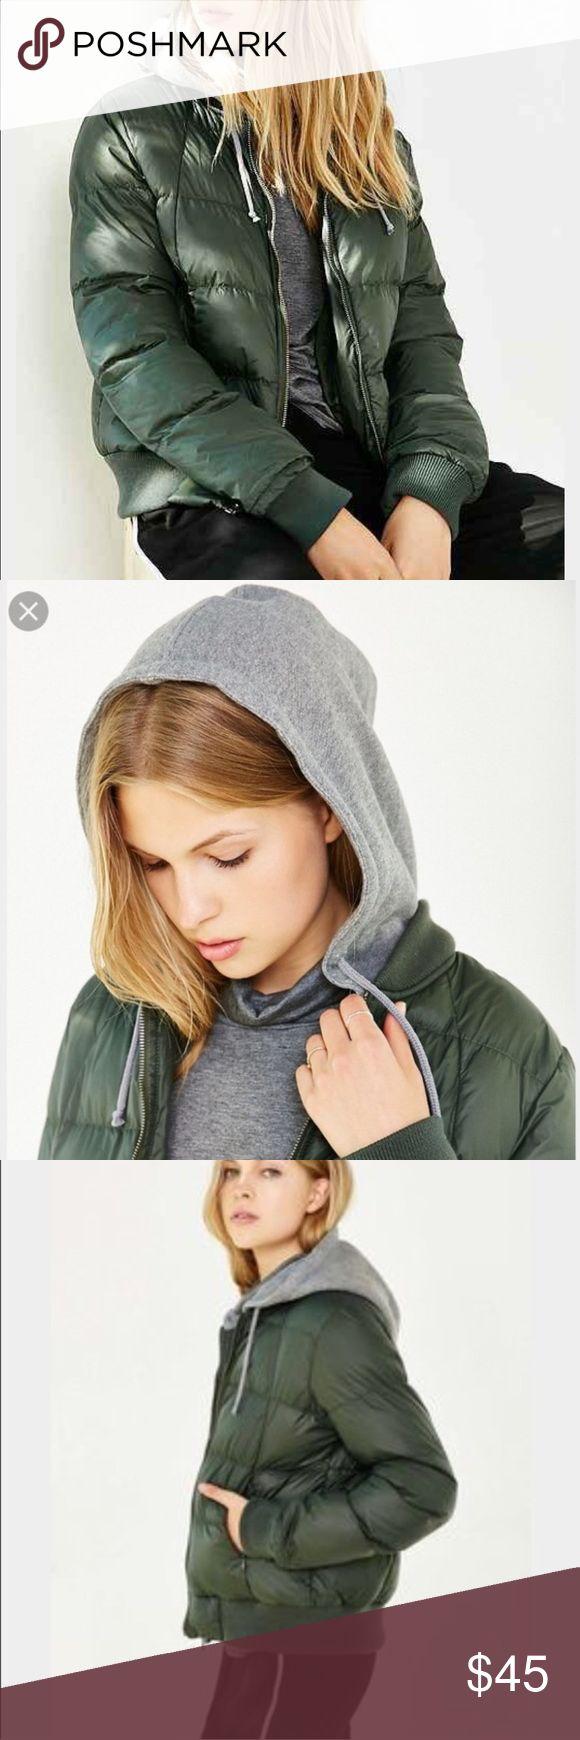 NWT BB Dakota Kiley puffer jacket Sporty puffer jacket with removable knit hood. Keep you warm no matter the weather. NWT. BB Dakota Jackets & Coats Puffers